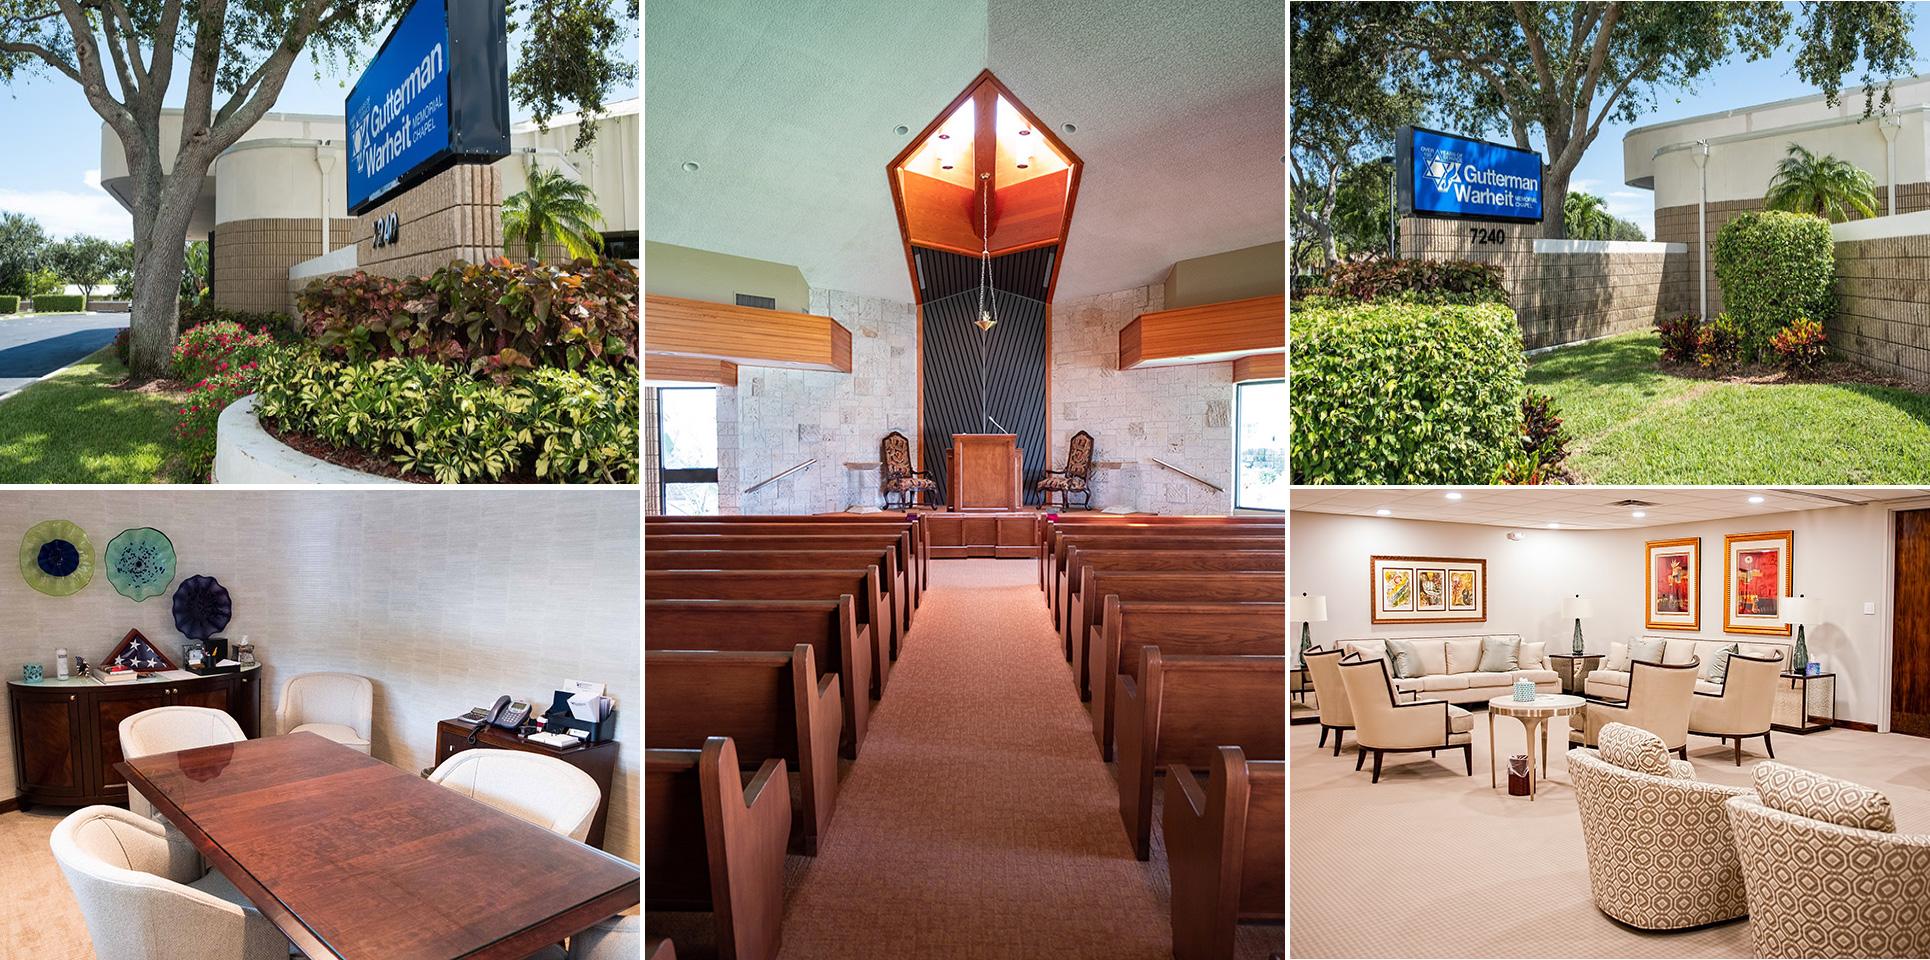 Gutterman-Warheit-Boca-Raton-building-chapel-conference-room-waiting-room